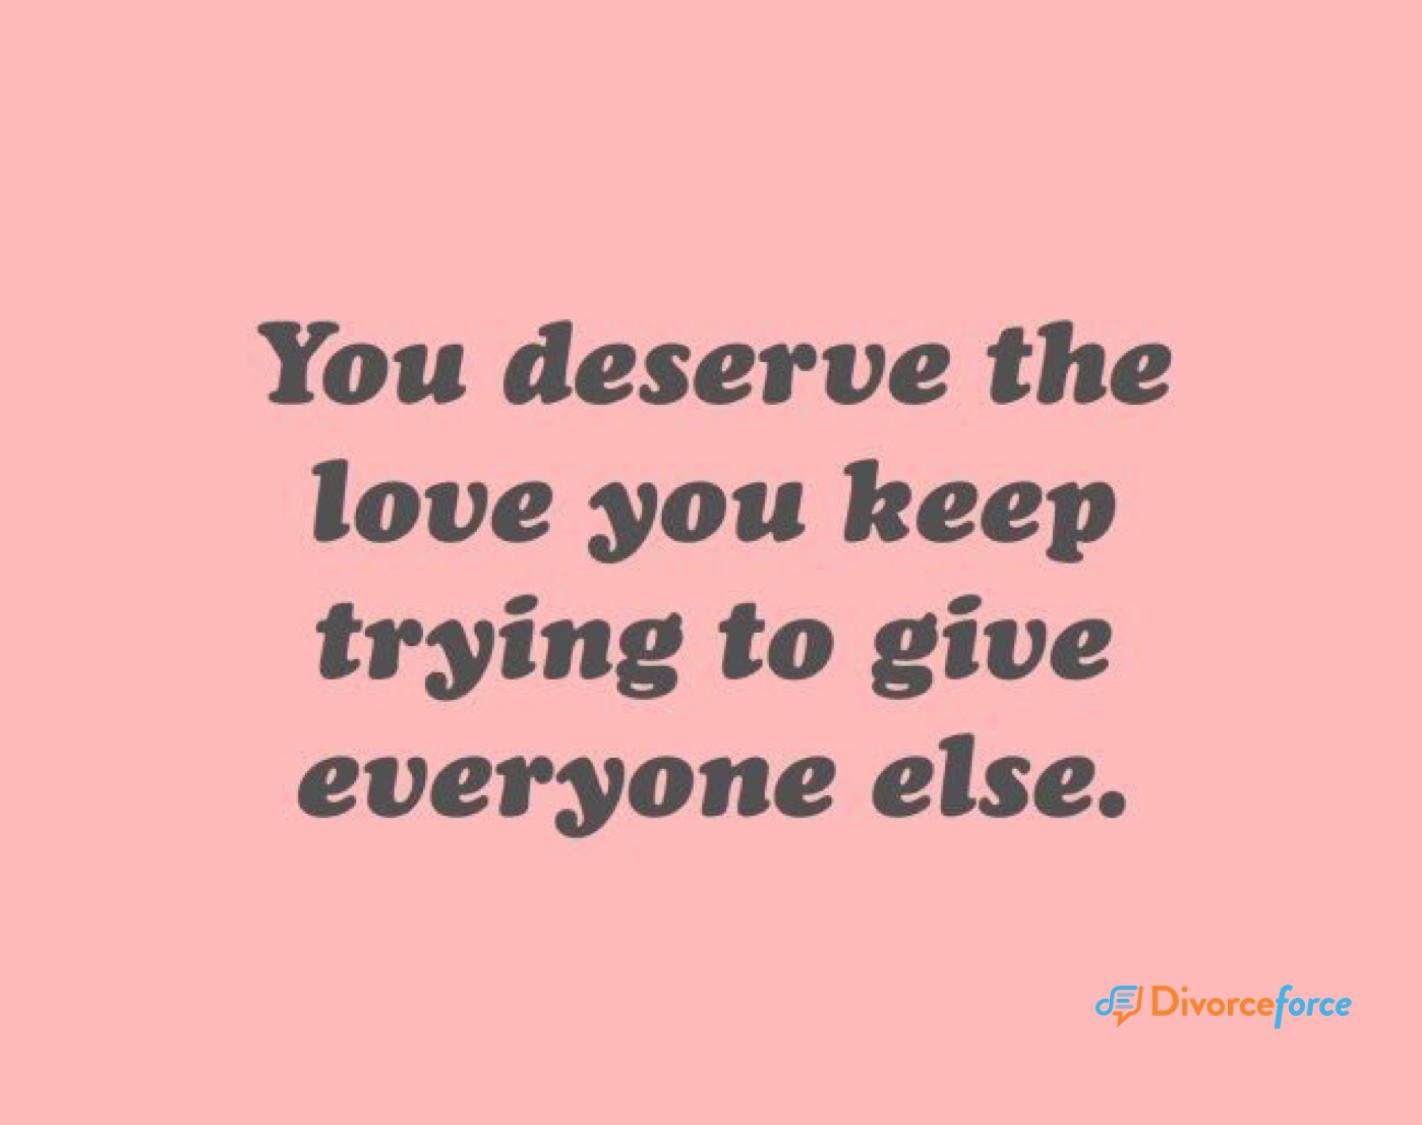 Divorce Quotes Pindivorceforce On Divorce Quotes  Pinterest